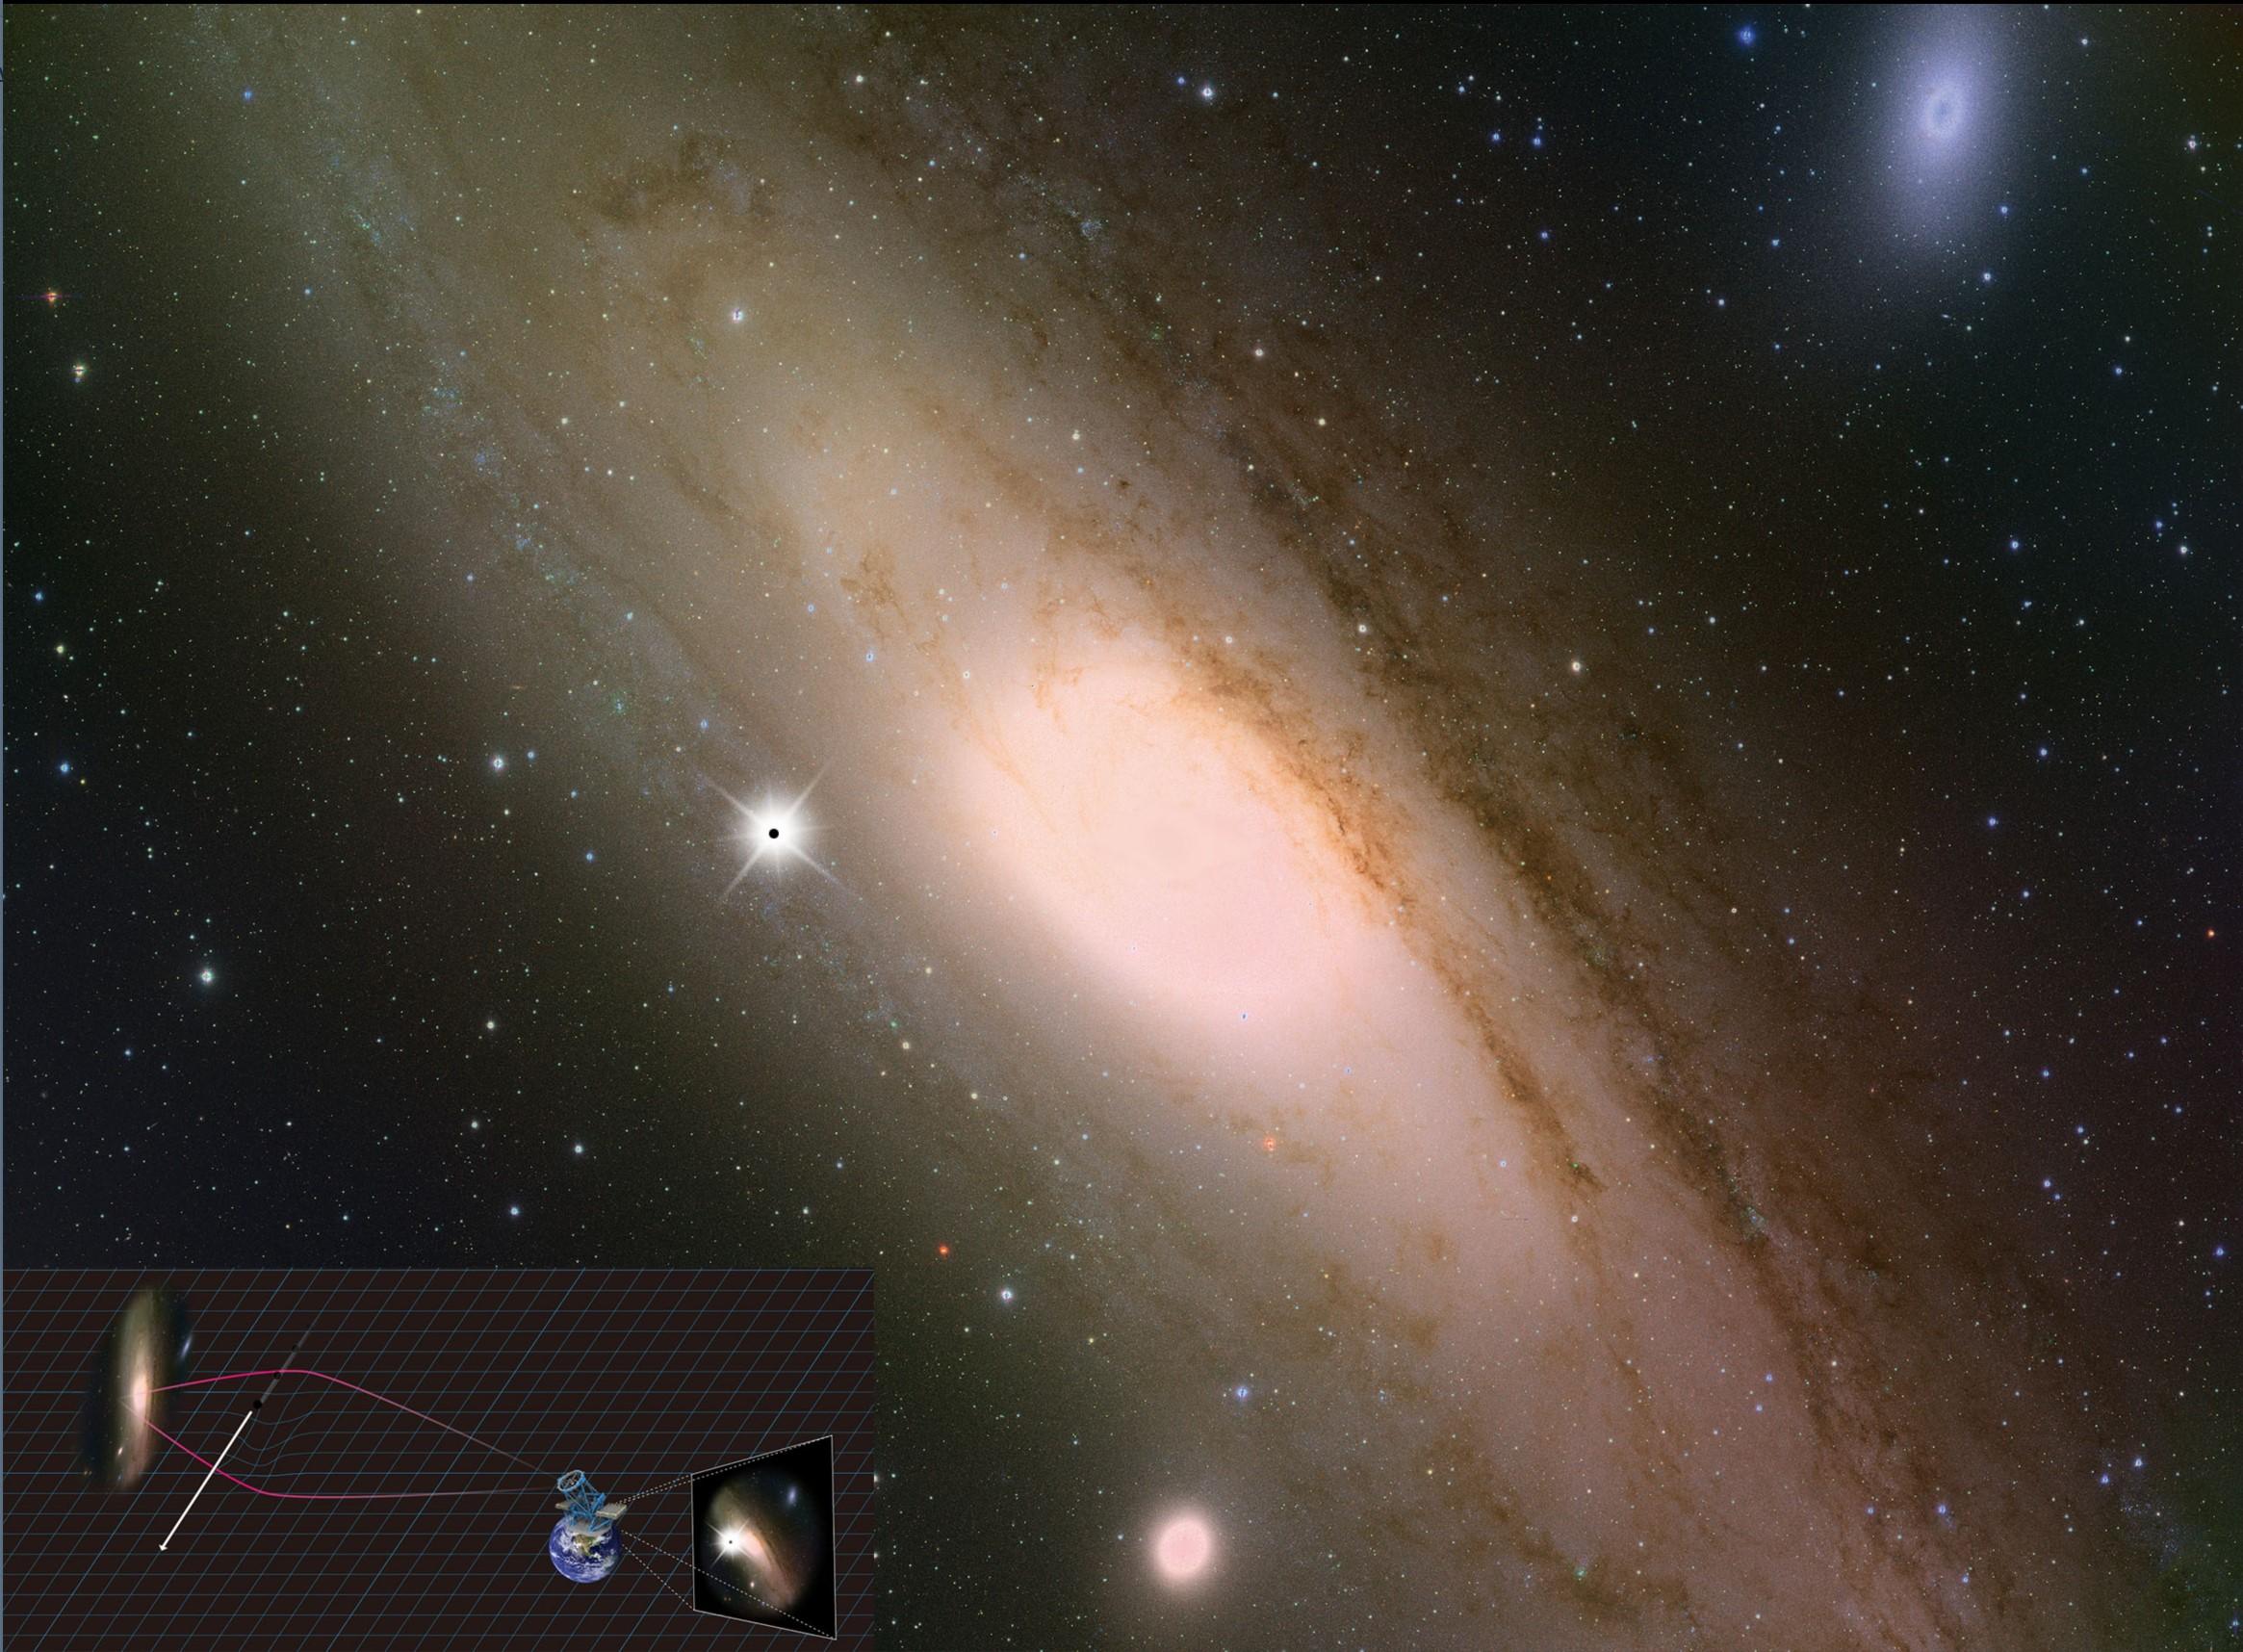 Scientists investigate dwarf planet Haumea ring beyond Pluto's orbit